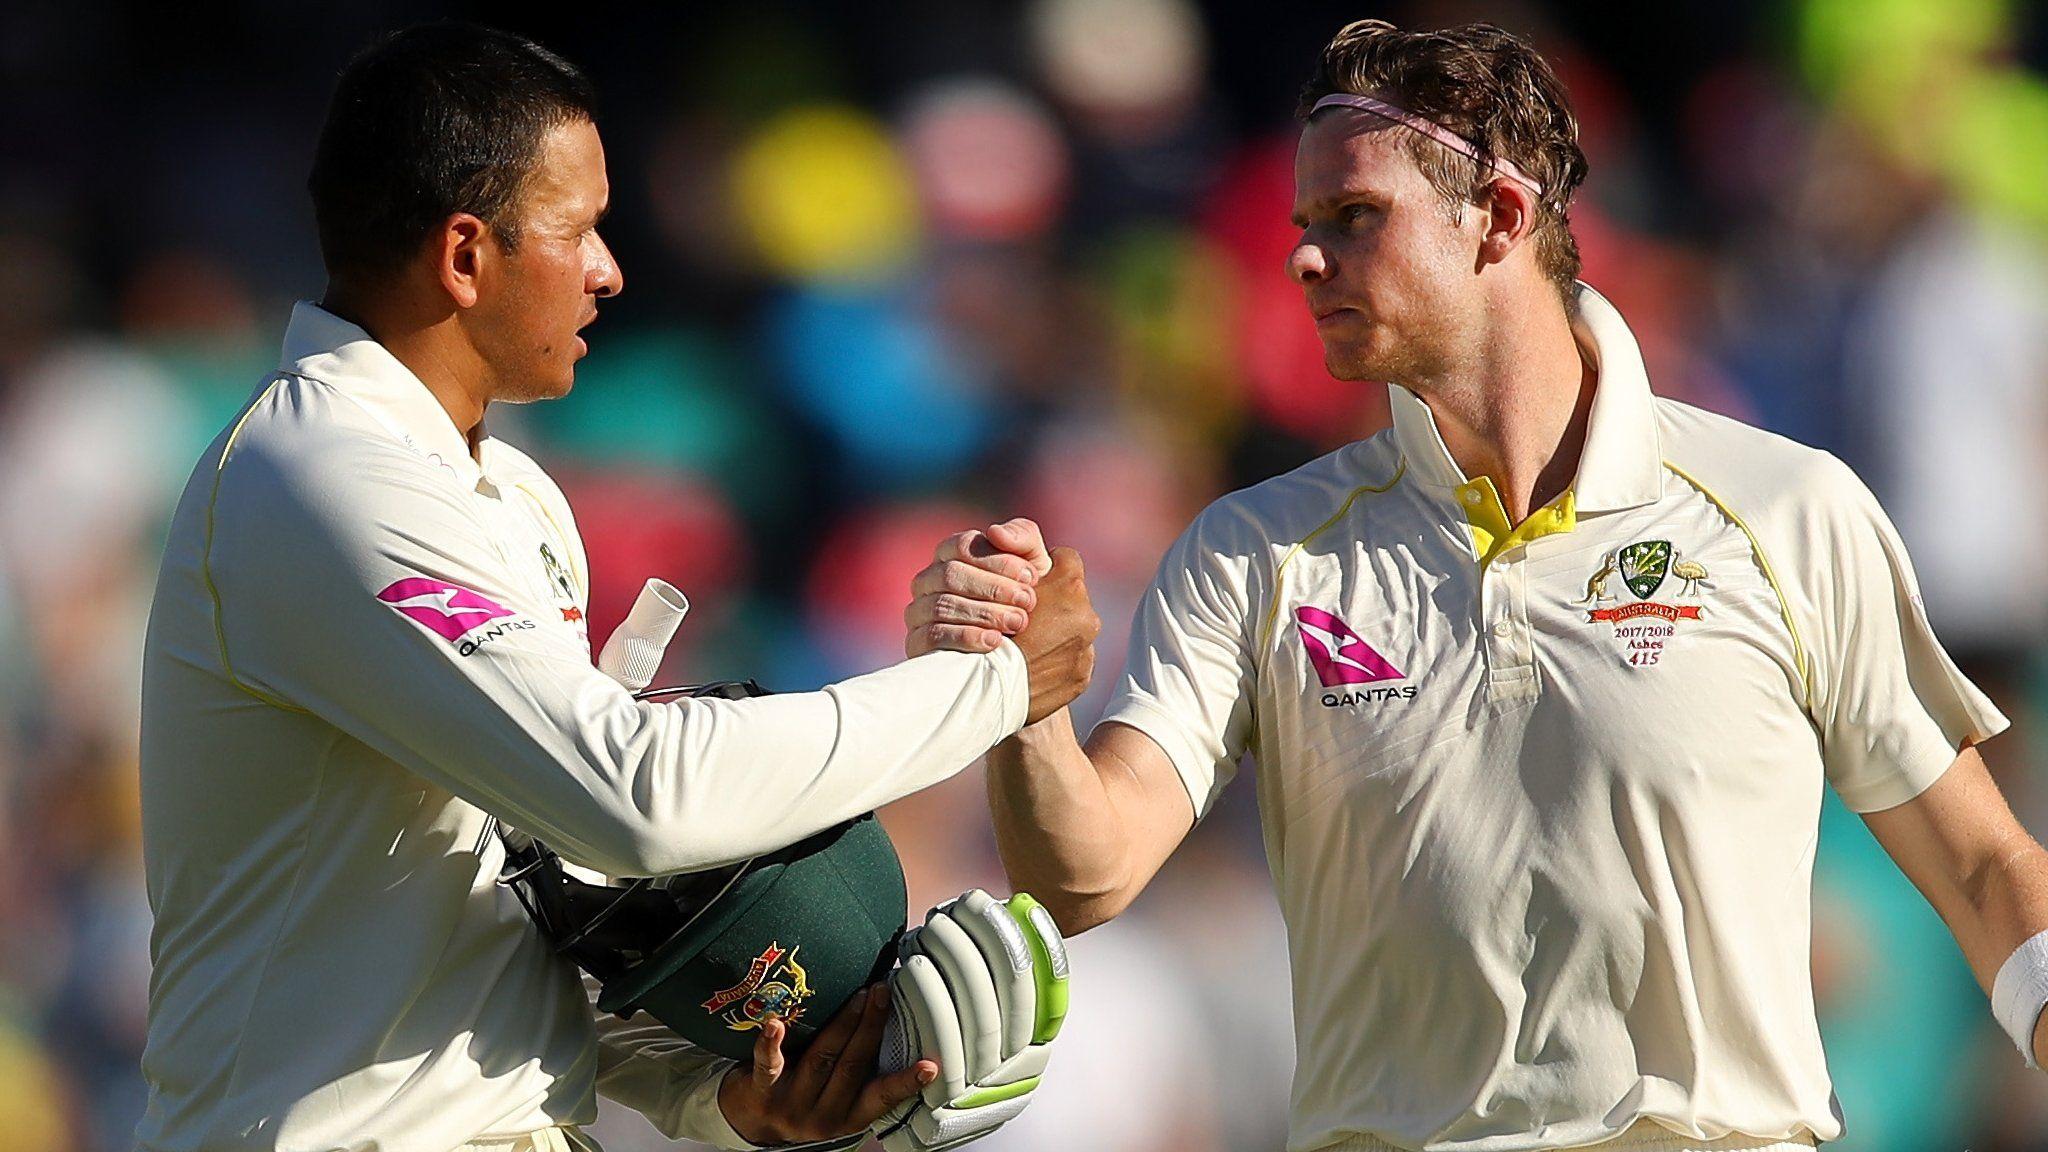 Catch a Million: New Zealand Cricket introduce 'catch zones